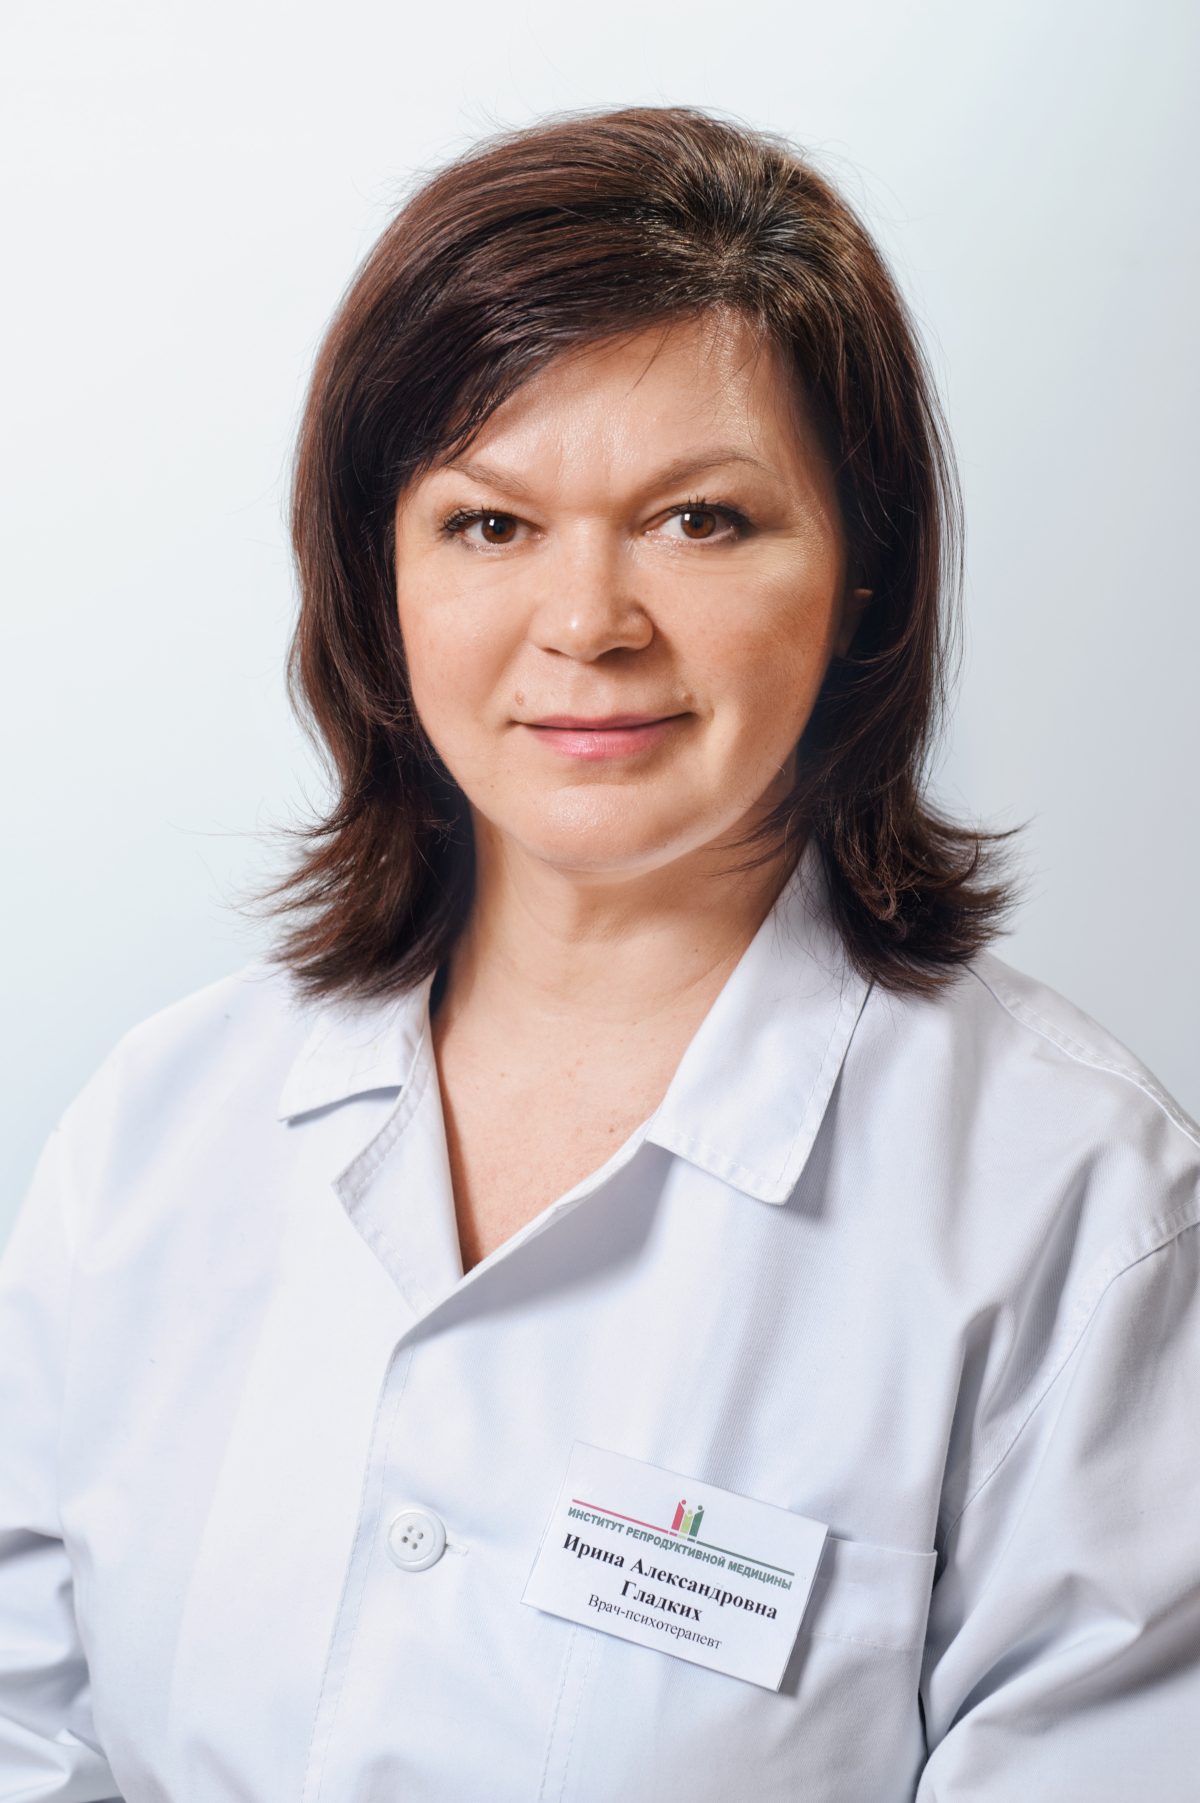 Гладких Ирина Александровна фото